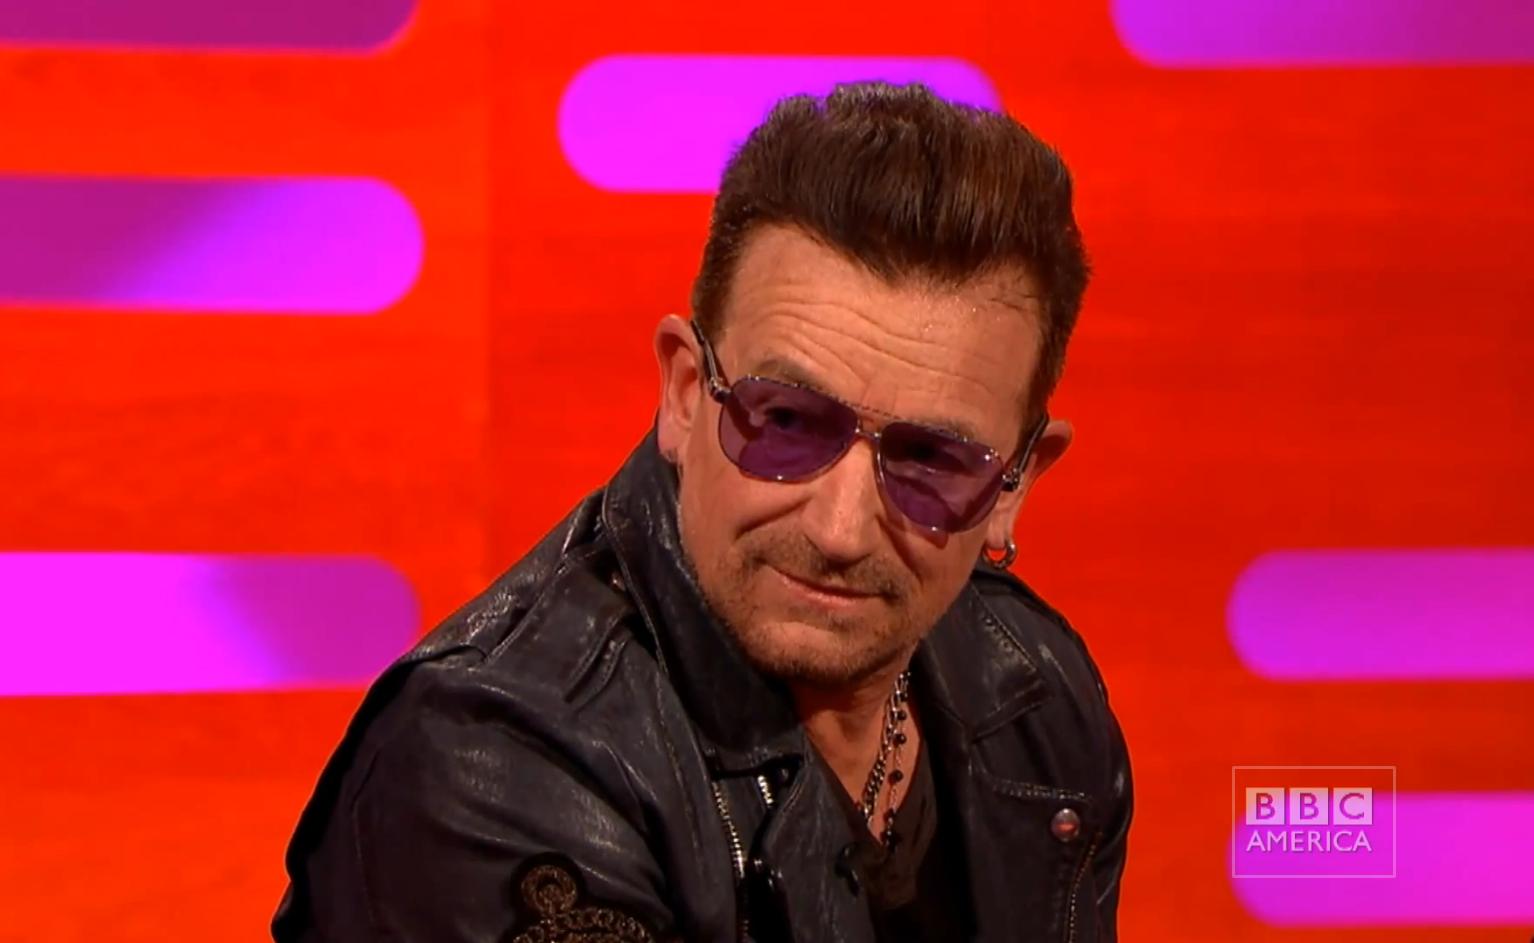 Here's the medical reason Bono always wears sunglasses ...